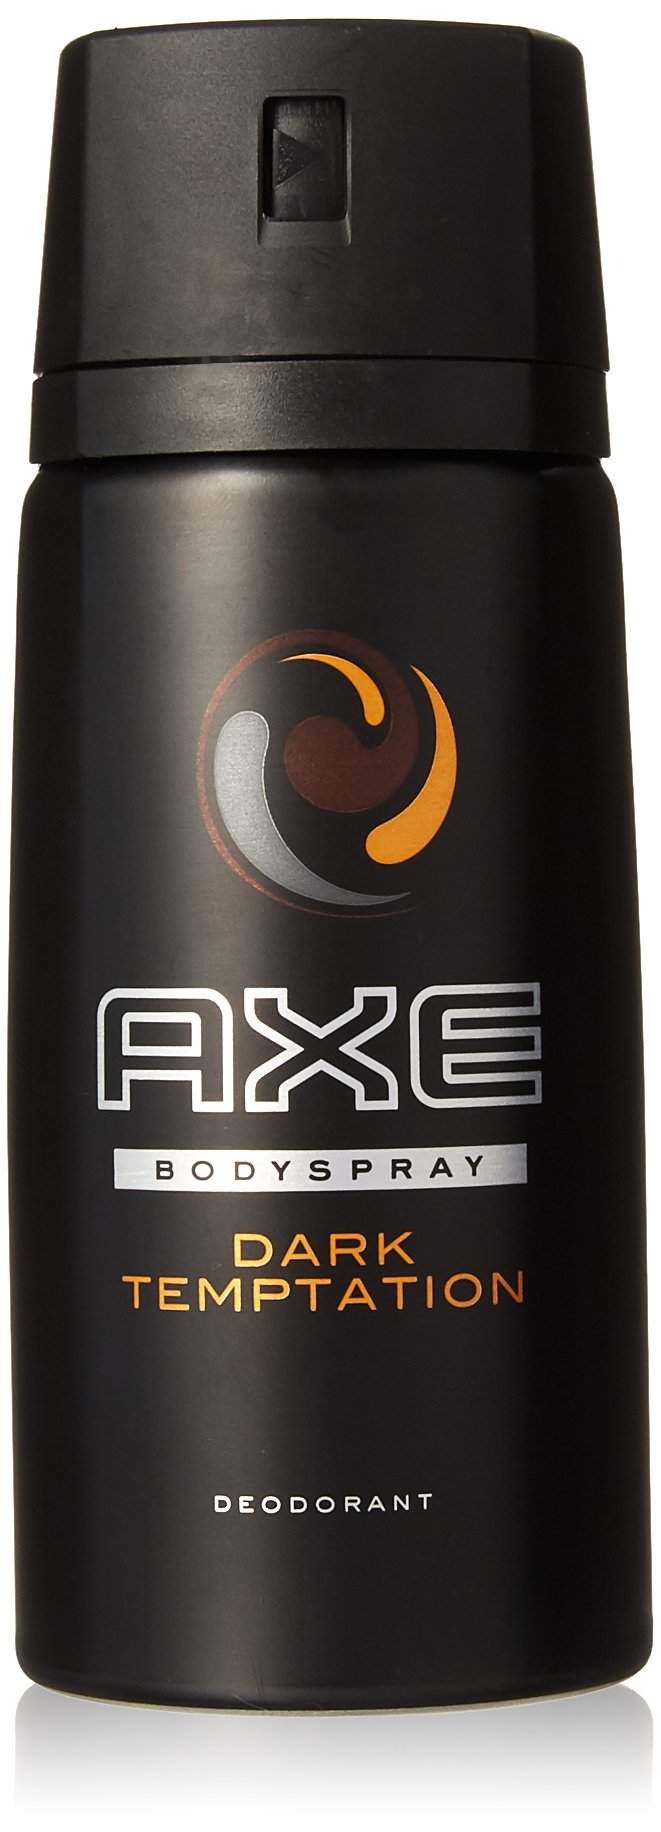 AXE Body Spray for Men, Dark Temptation (4 oz, (Pack of 12), Dark Temptation)